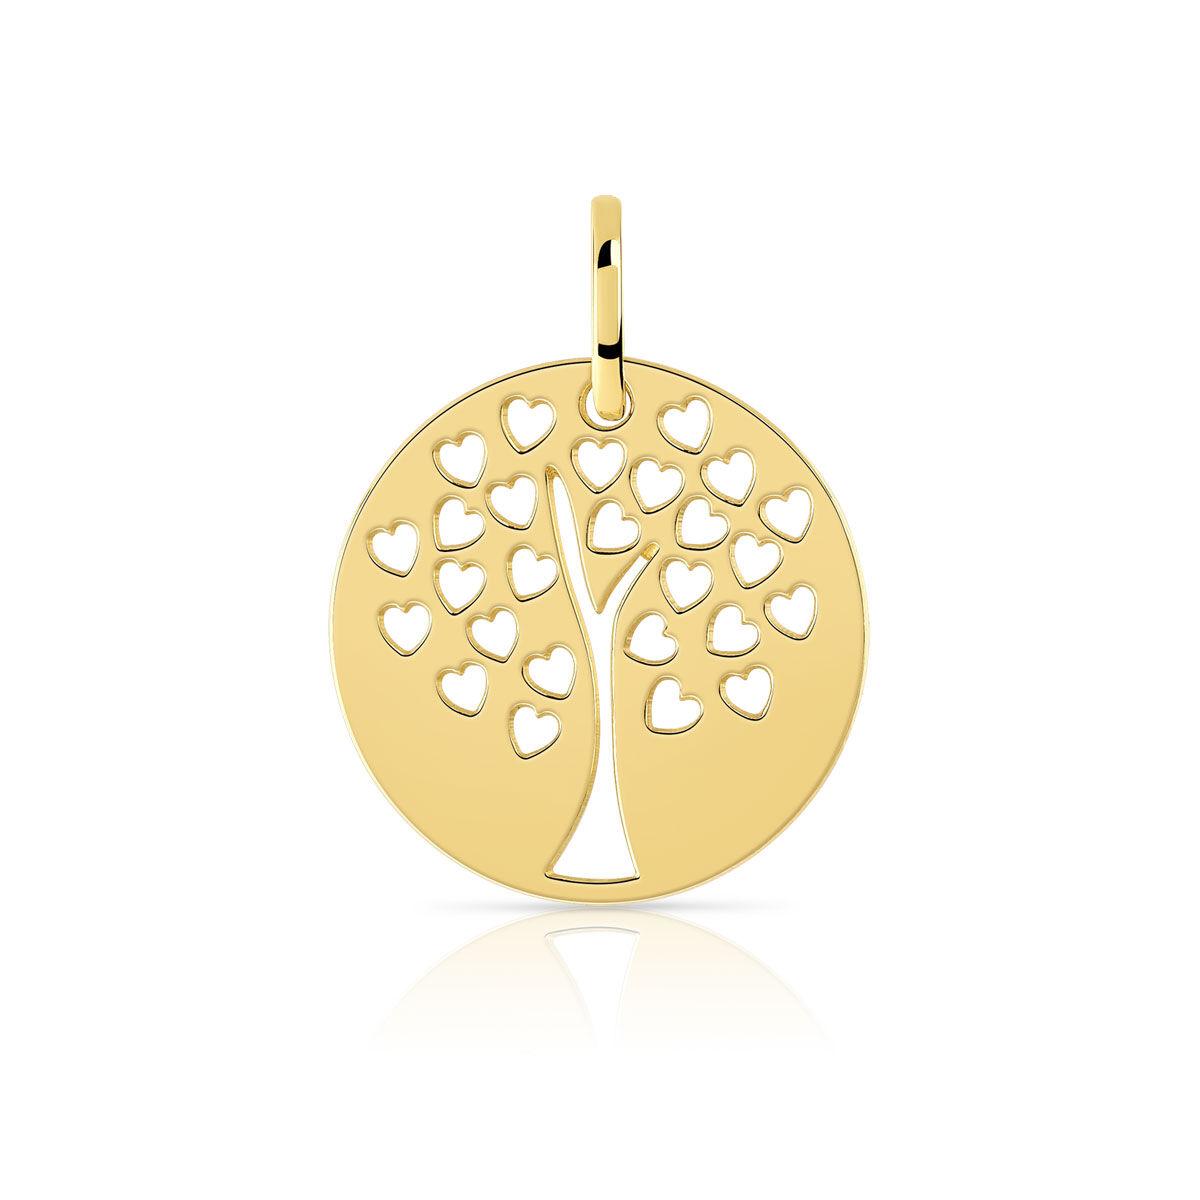 MATY Pendentif or 375 jaune arbre de vie- MATY